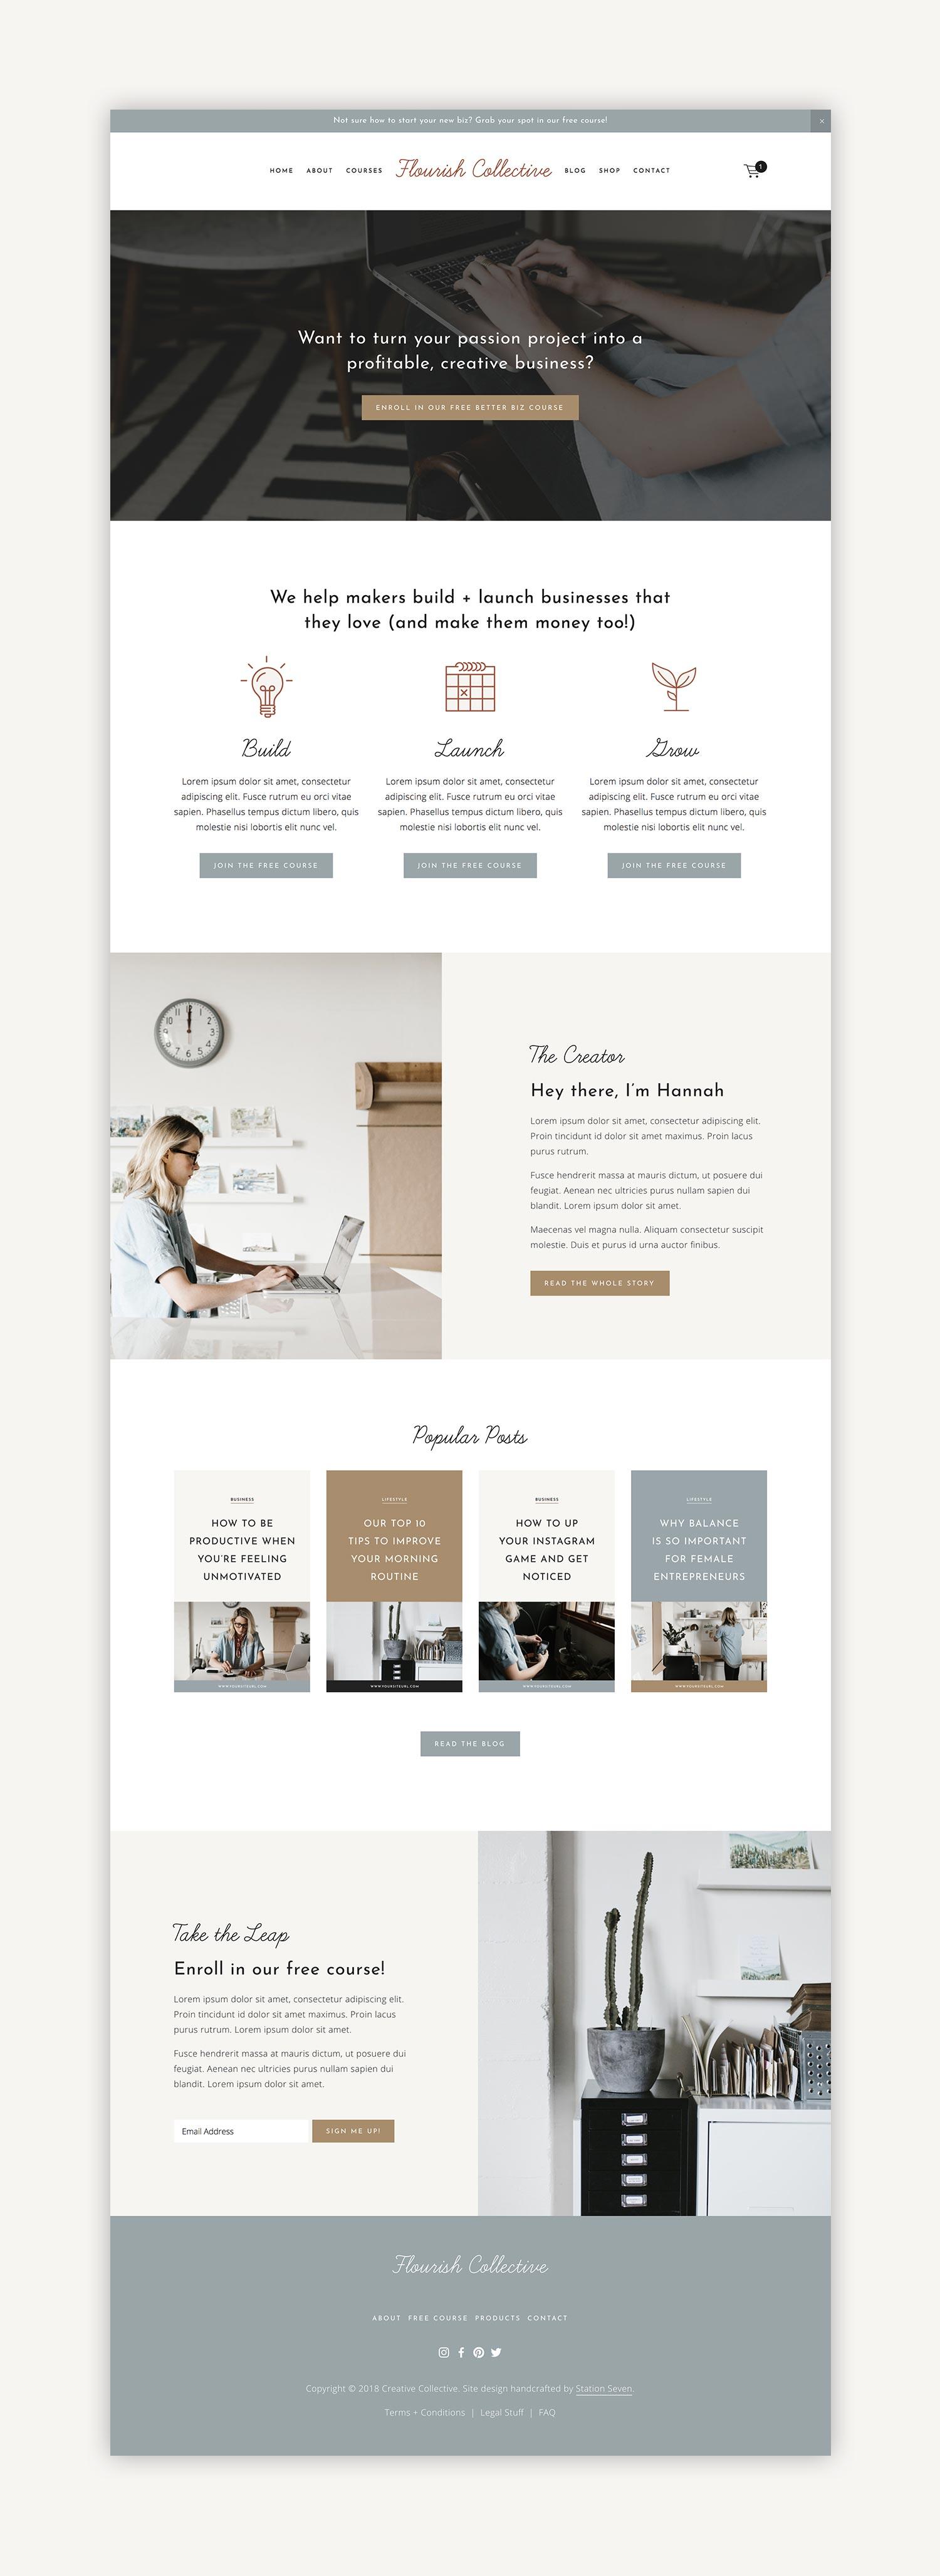 e2561cb42d529 Flourish Squarespace Kit — Station Seven: Squarespace Templates, WordPress  Themes, and Free Resources for Creative Entrepreneurs